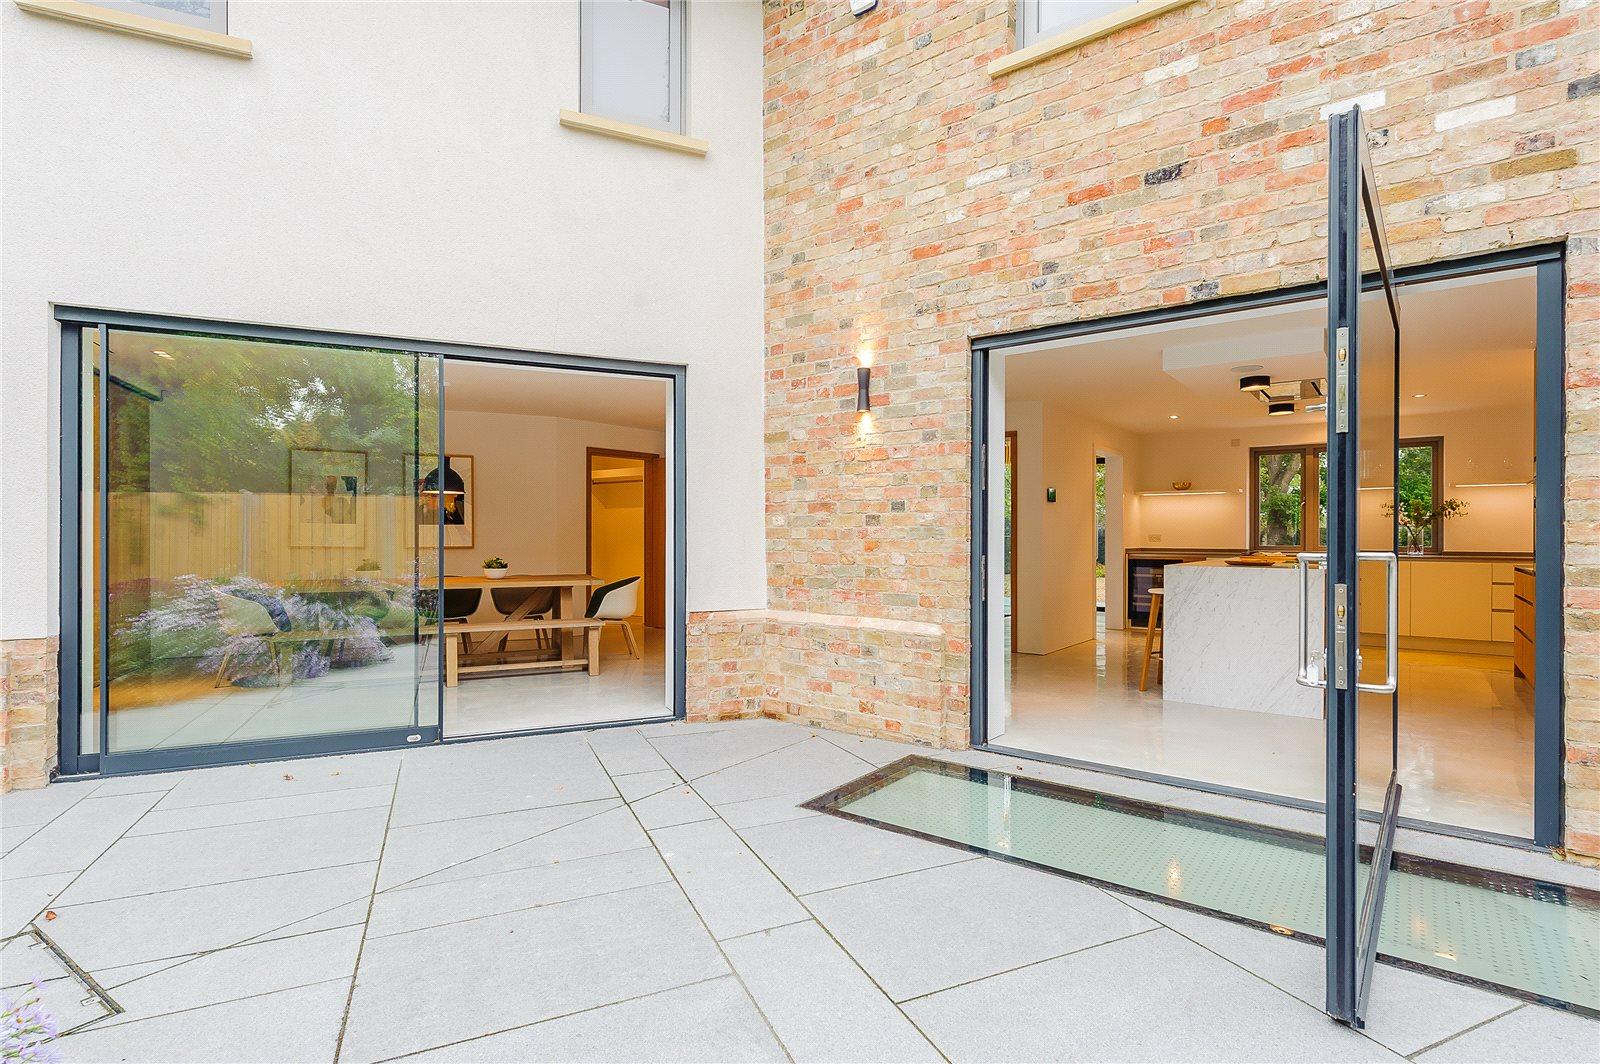 Additional photo for property listing at Comberton Road, Barton, Cambridge, CB23 英格兰